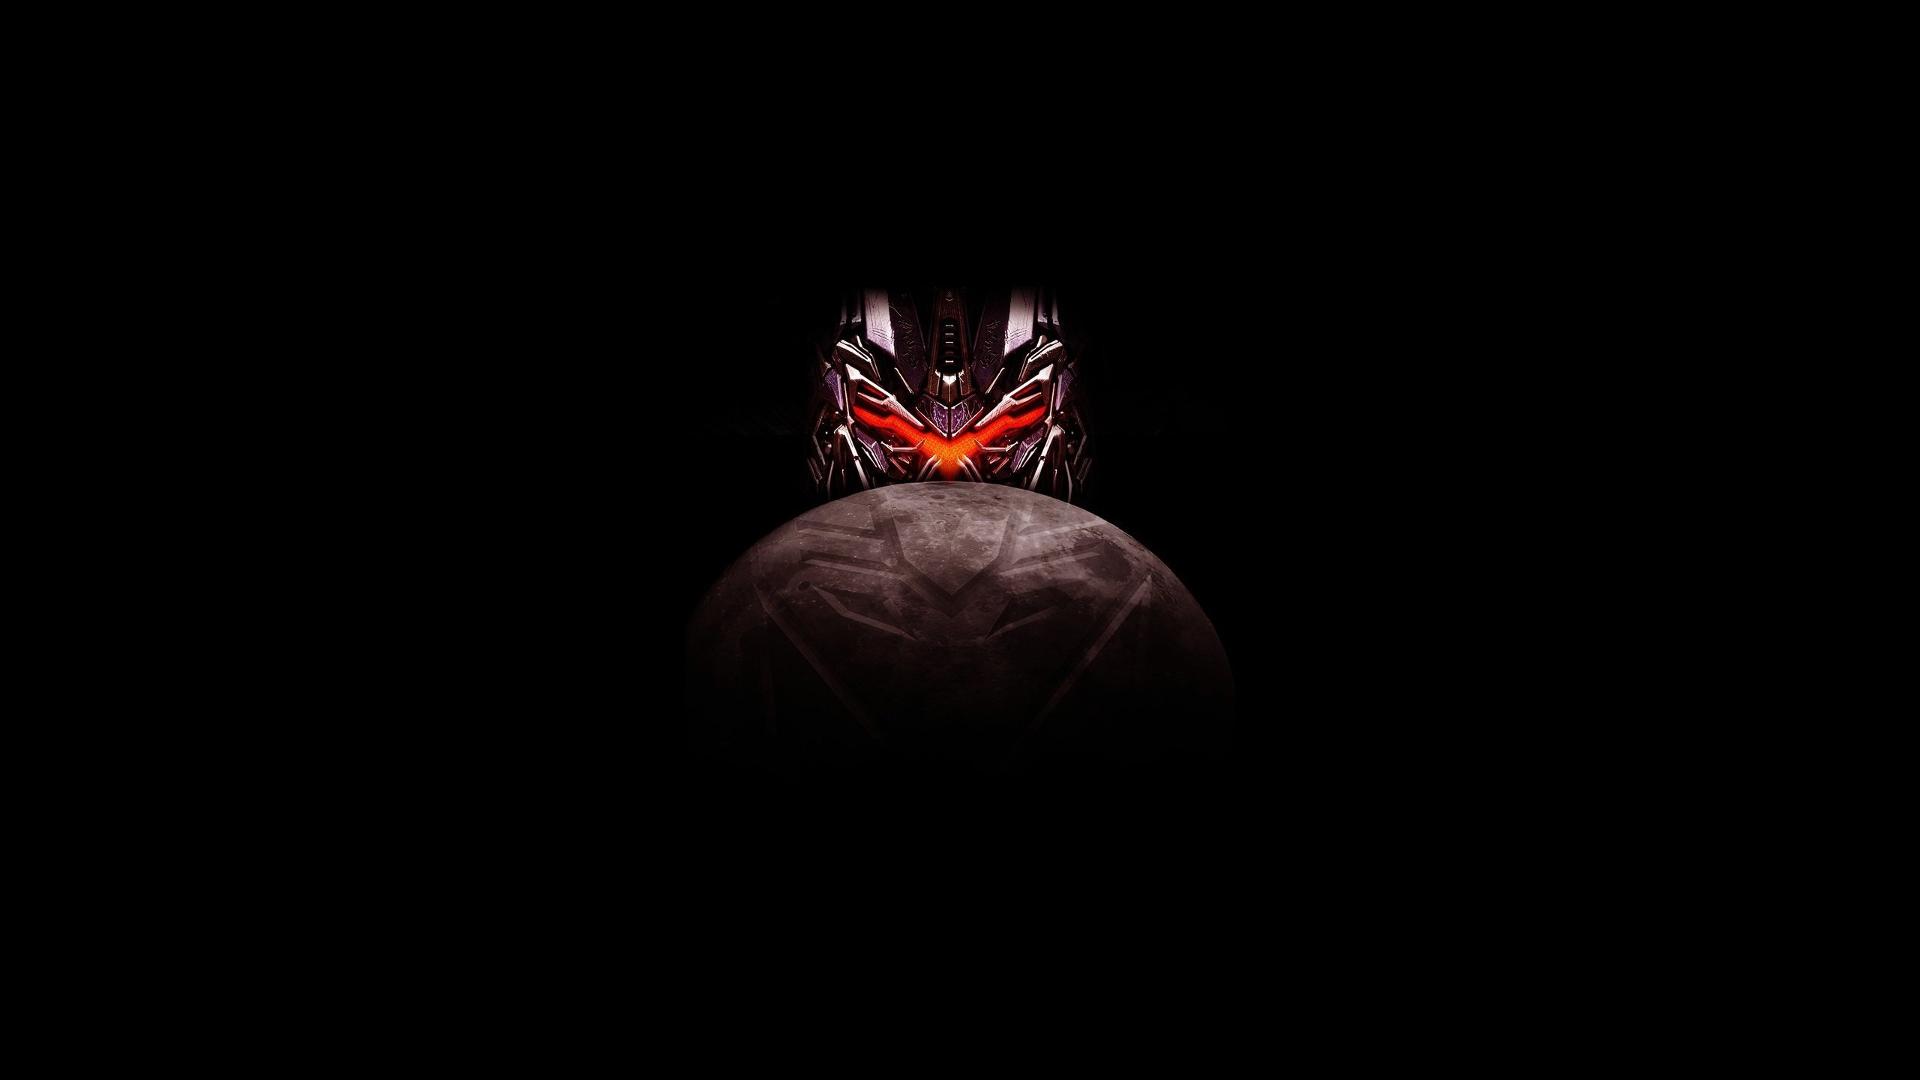 Transformers Iphone 6 Plus Wallpaper Transformers Dark Of The Moon Full Hd Wallpaper And